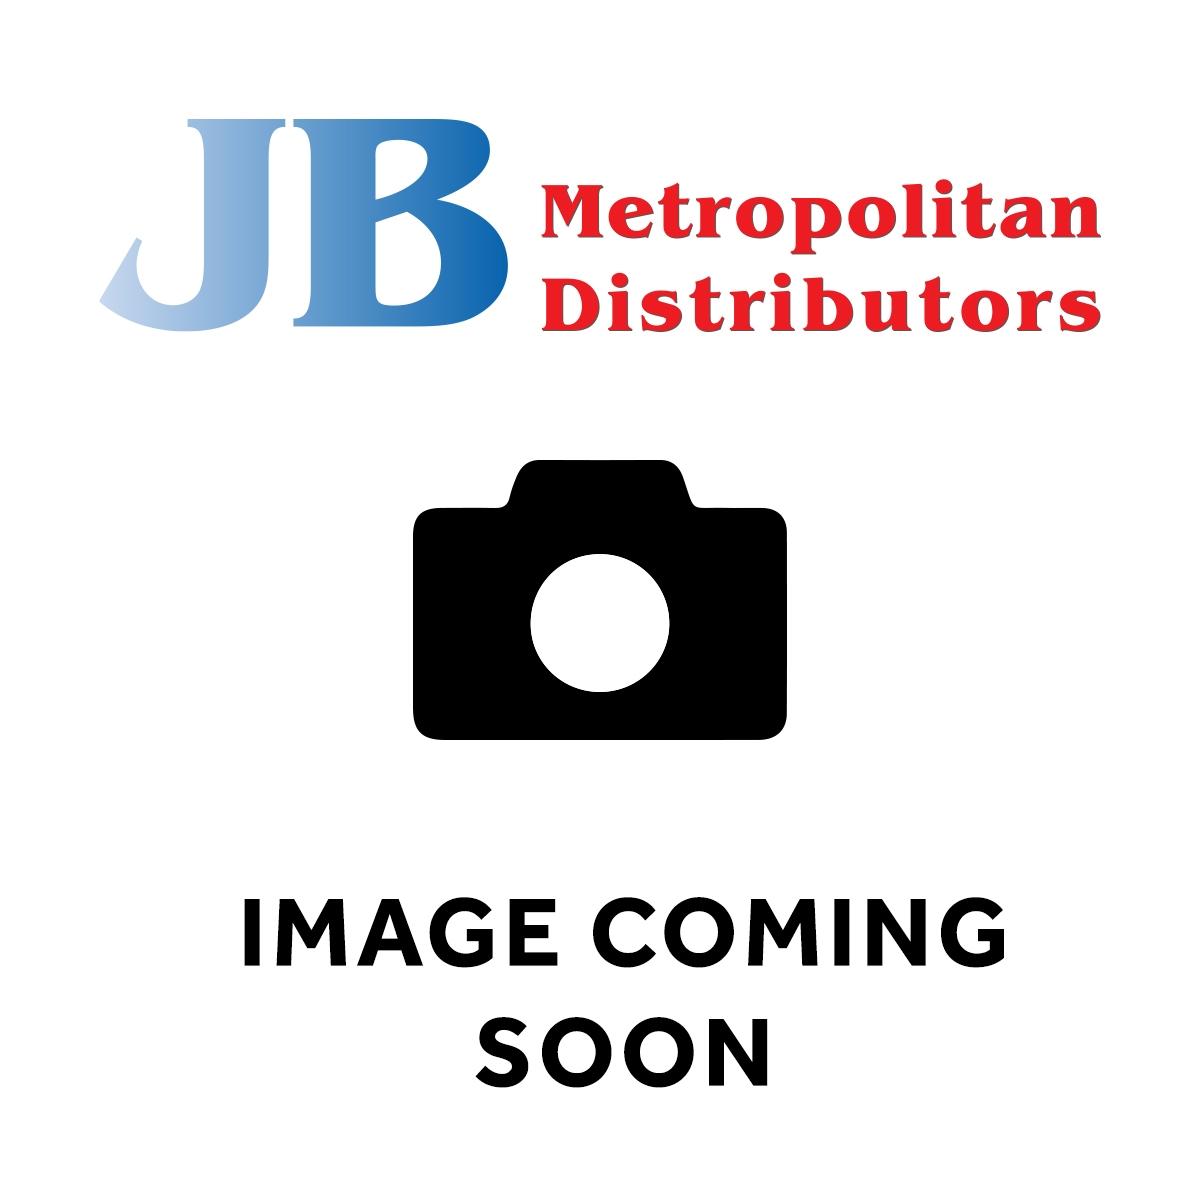 BUNDABERG PINEAPPLE & COCONUT 375ML